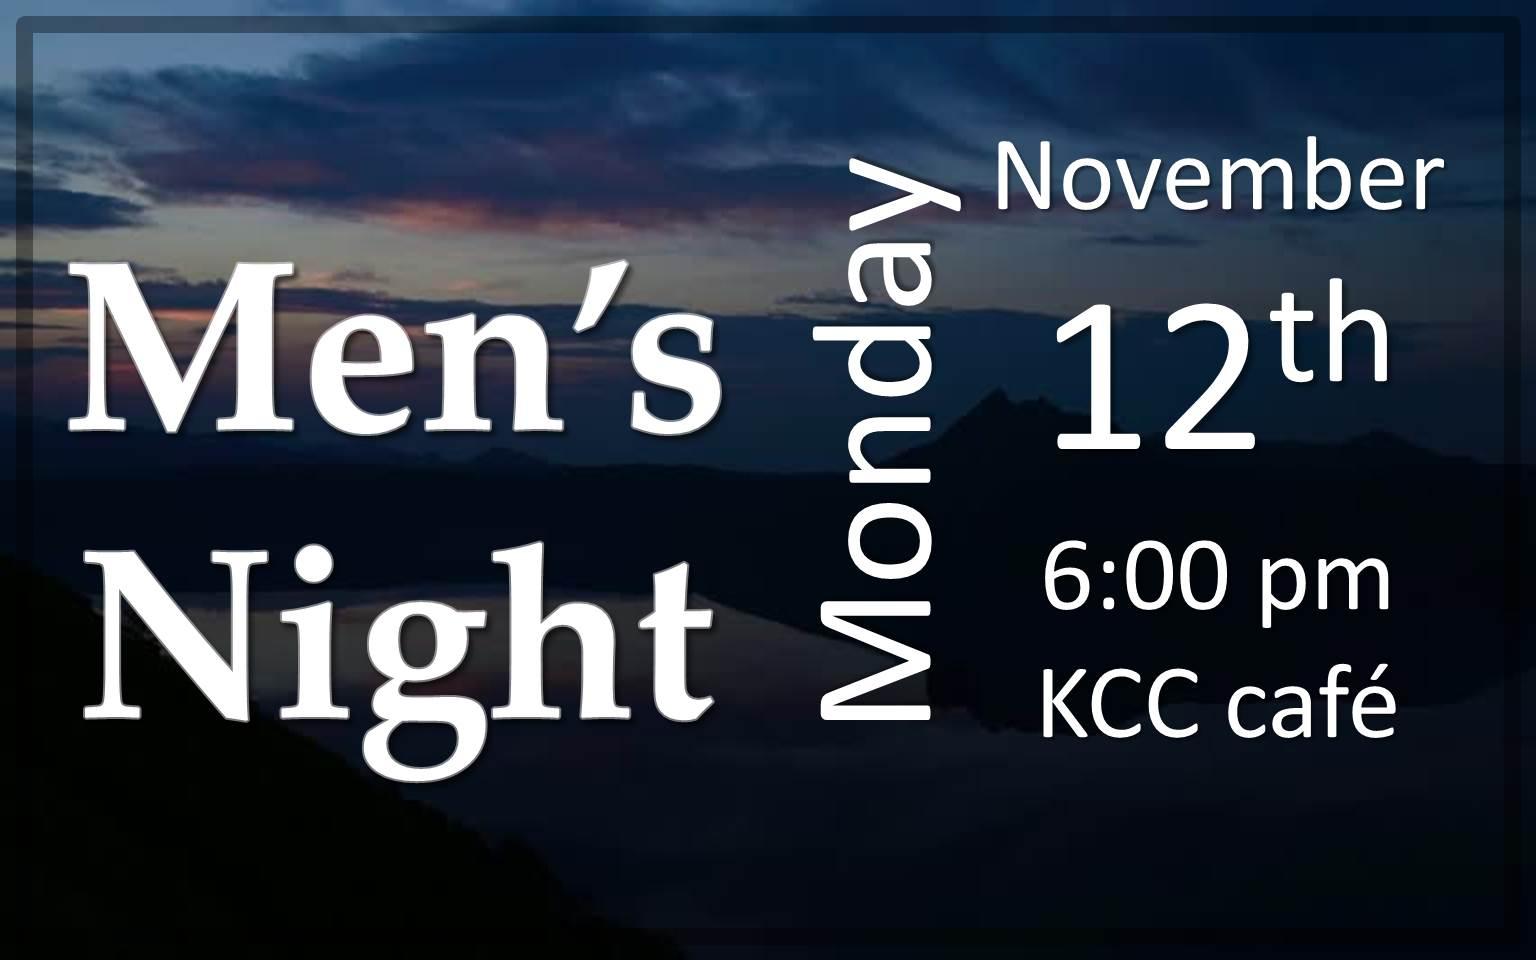 Men's Night 11.12.18 jpeg.jpg